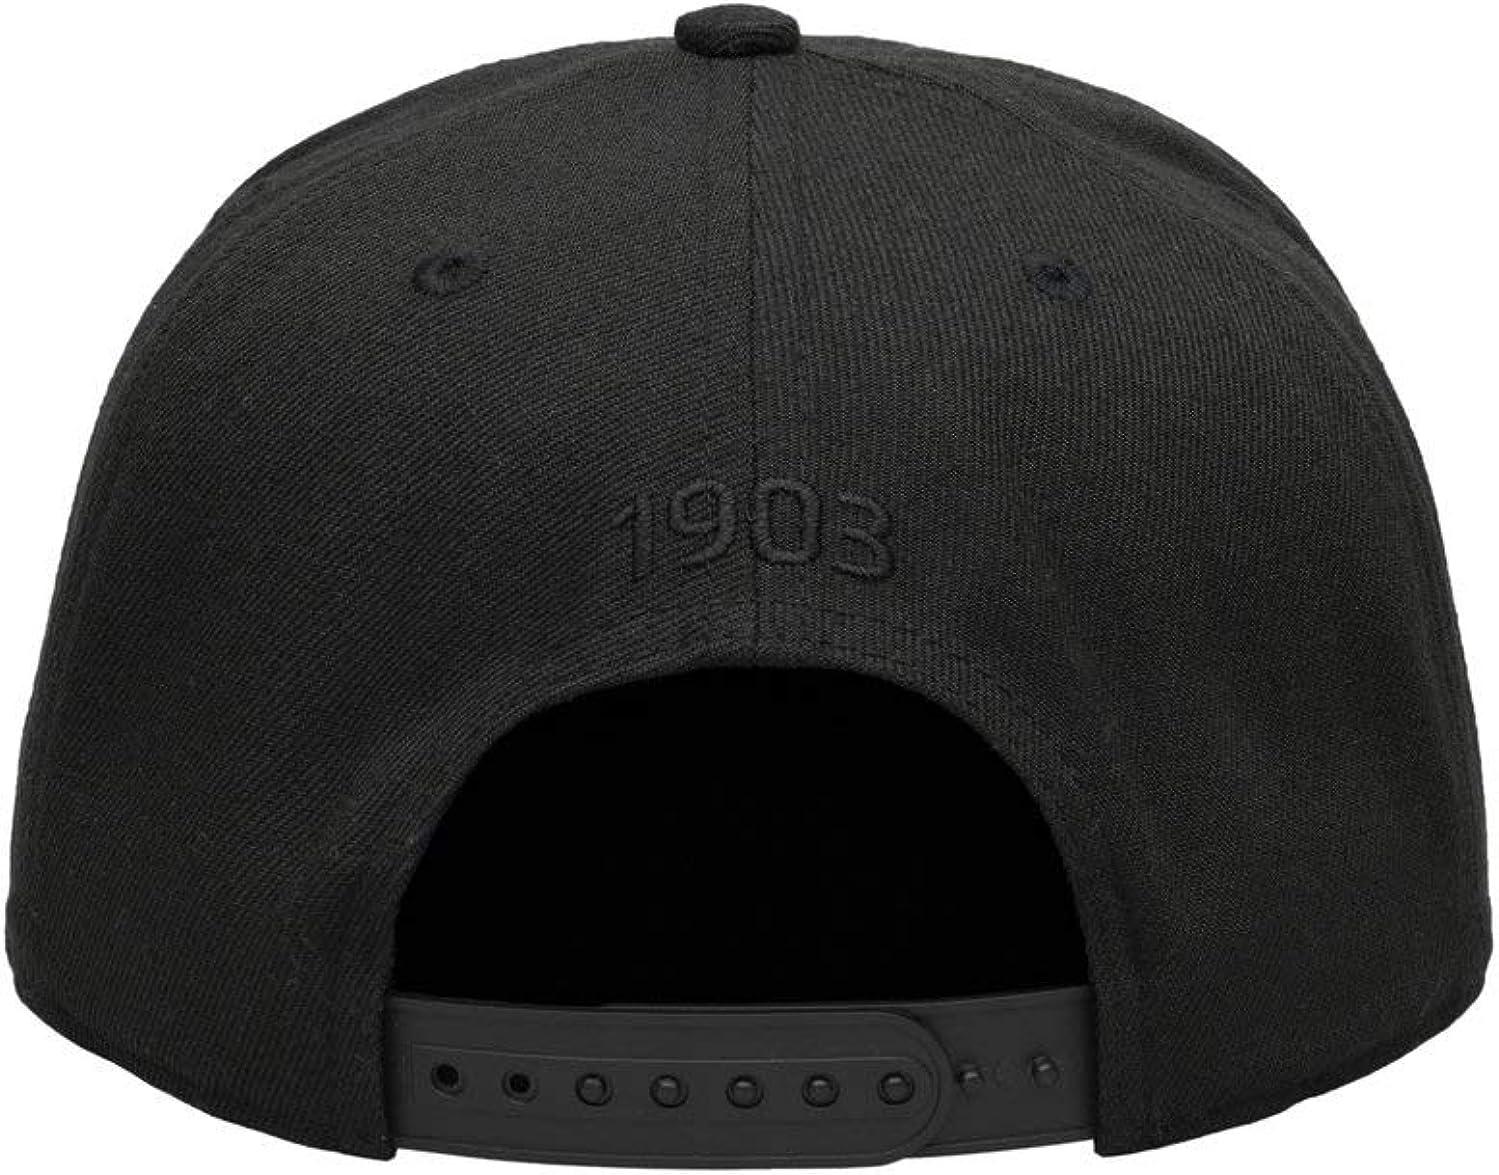 FI COLLECTION Atletico Madrid Dusk Snapback HAT Black